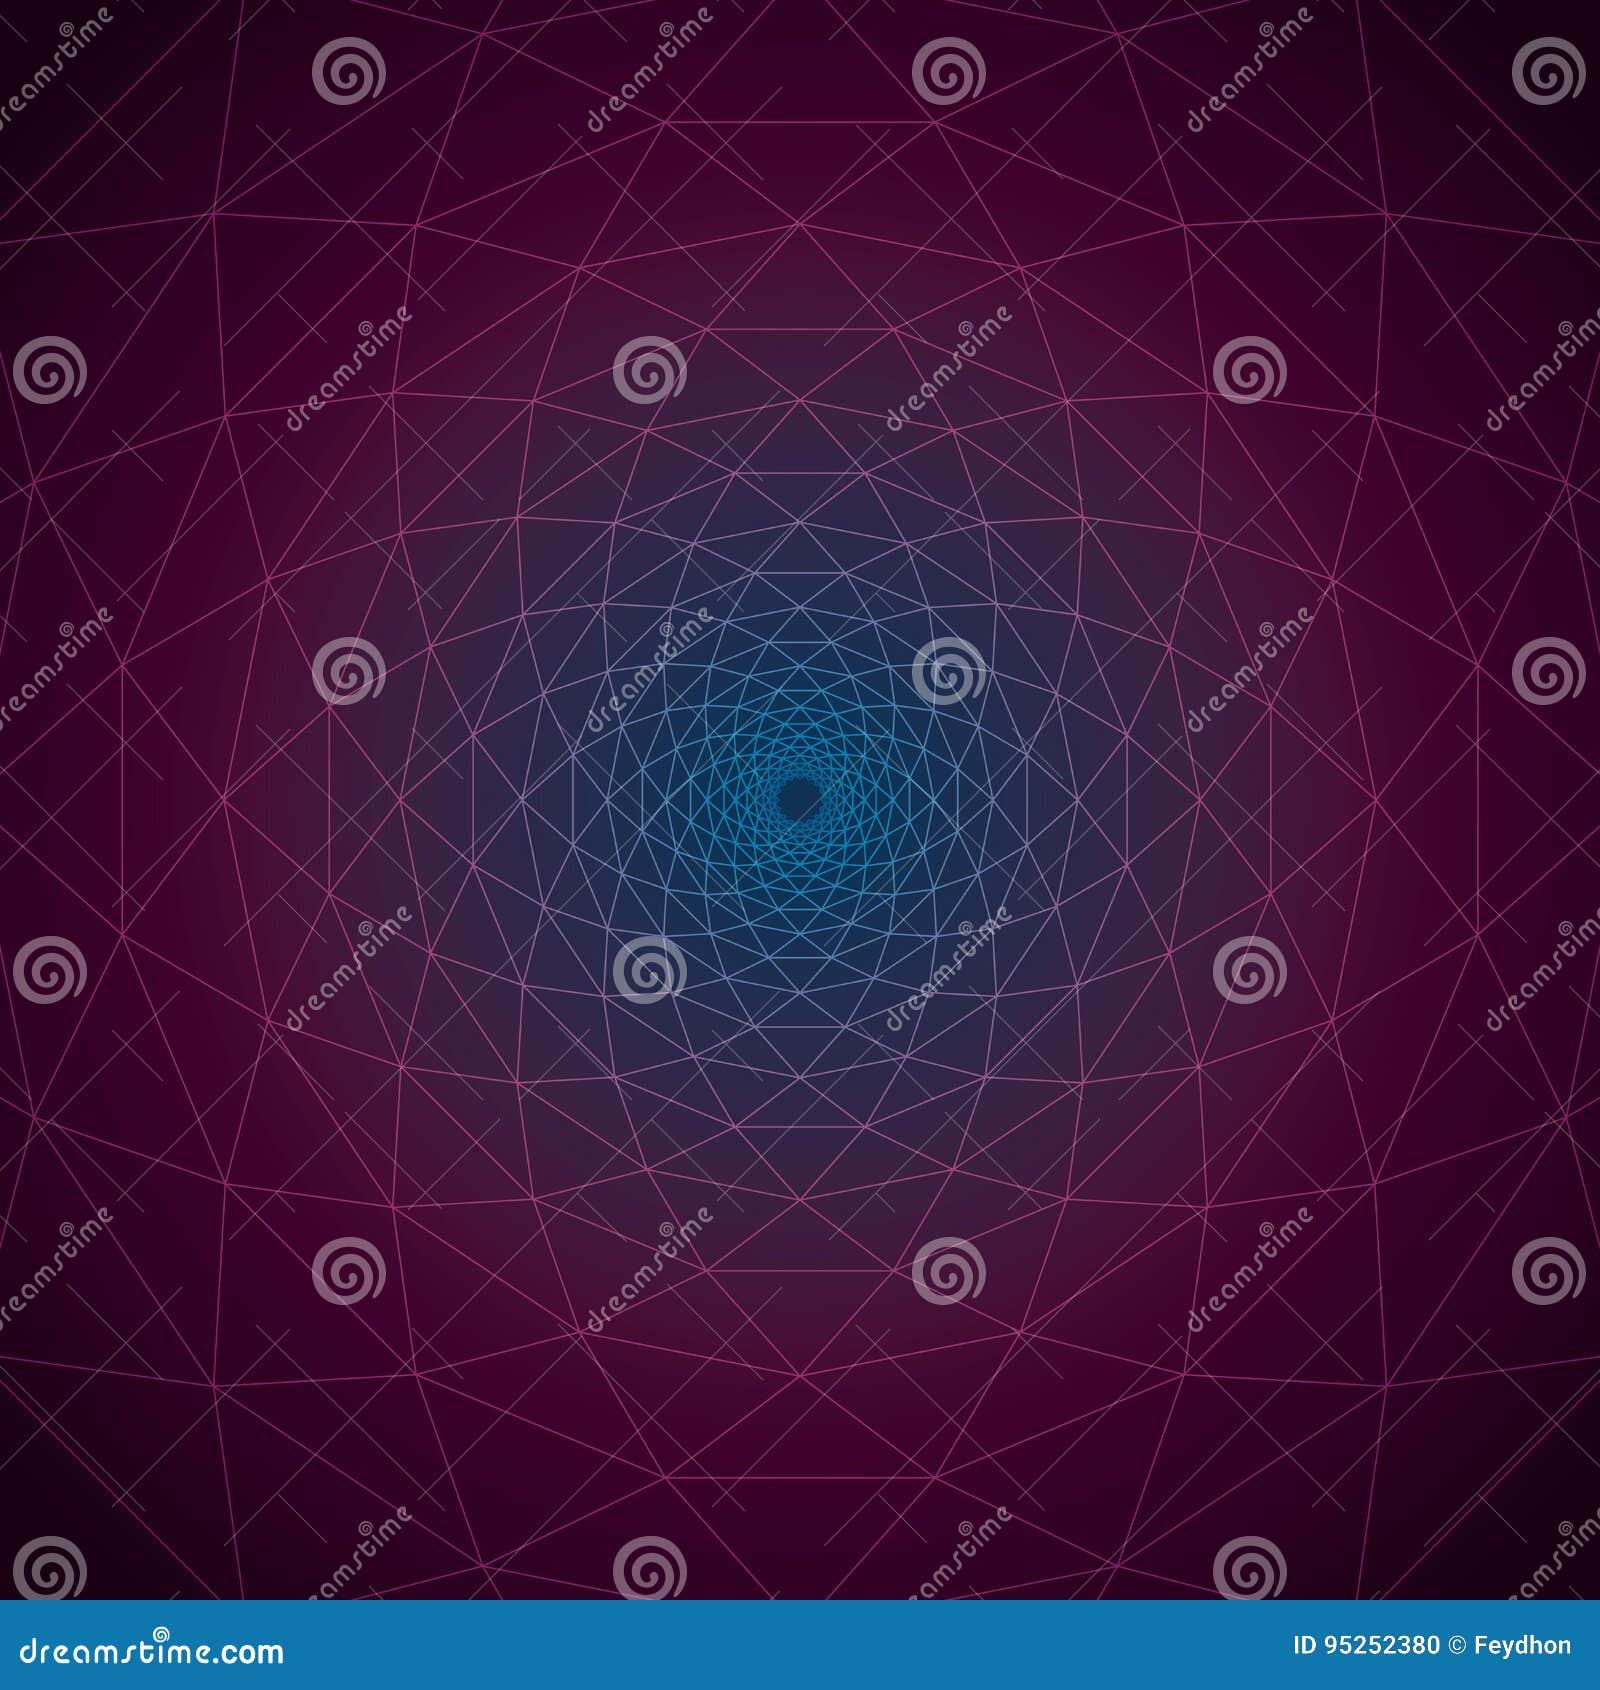 Trivexen-Dämmerung: Dreieckige Turbulenz-geometrische Linien Auf ...